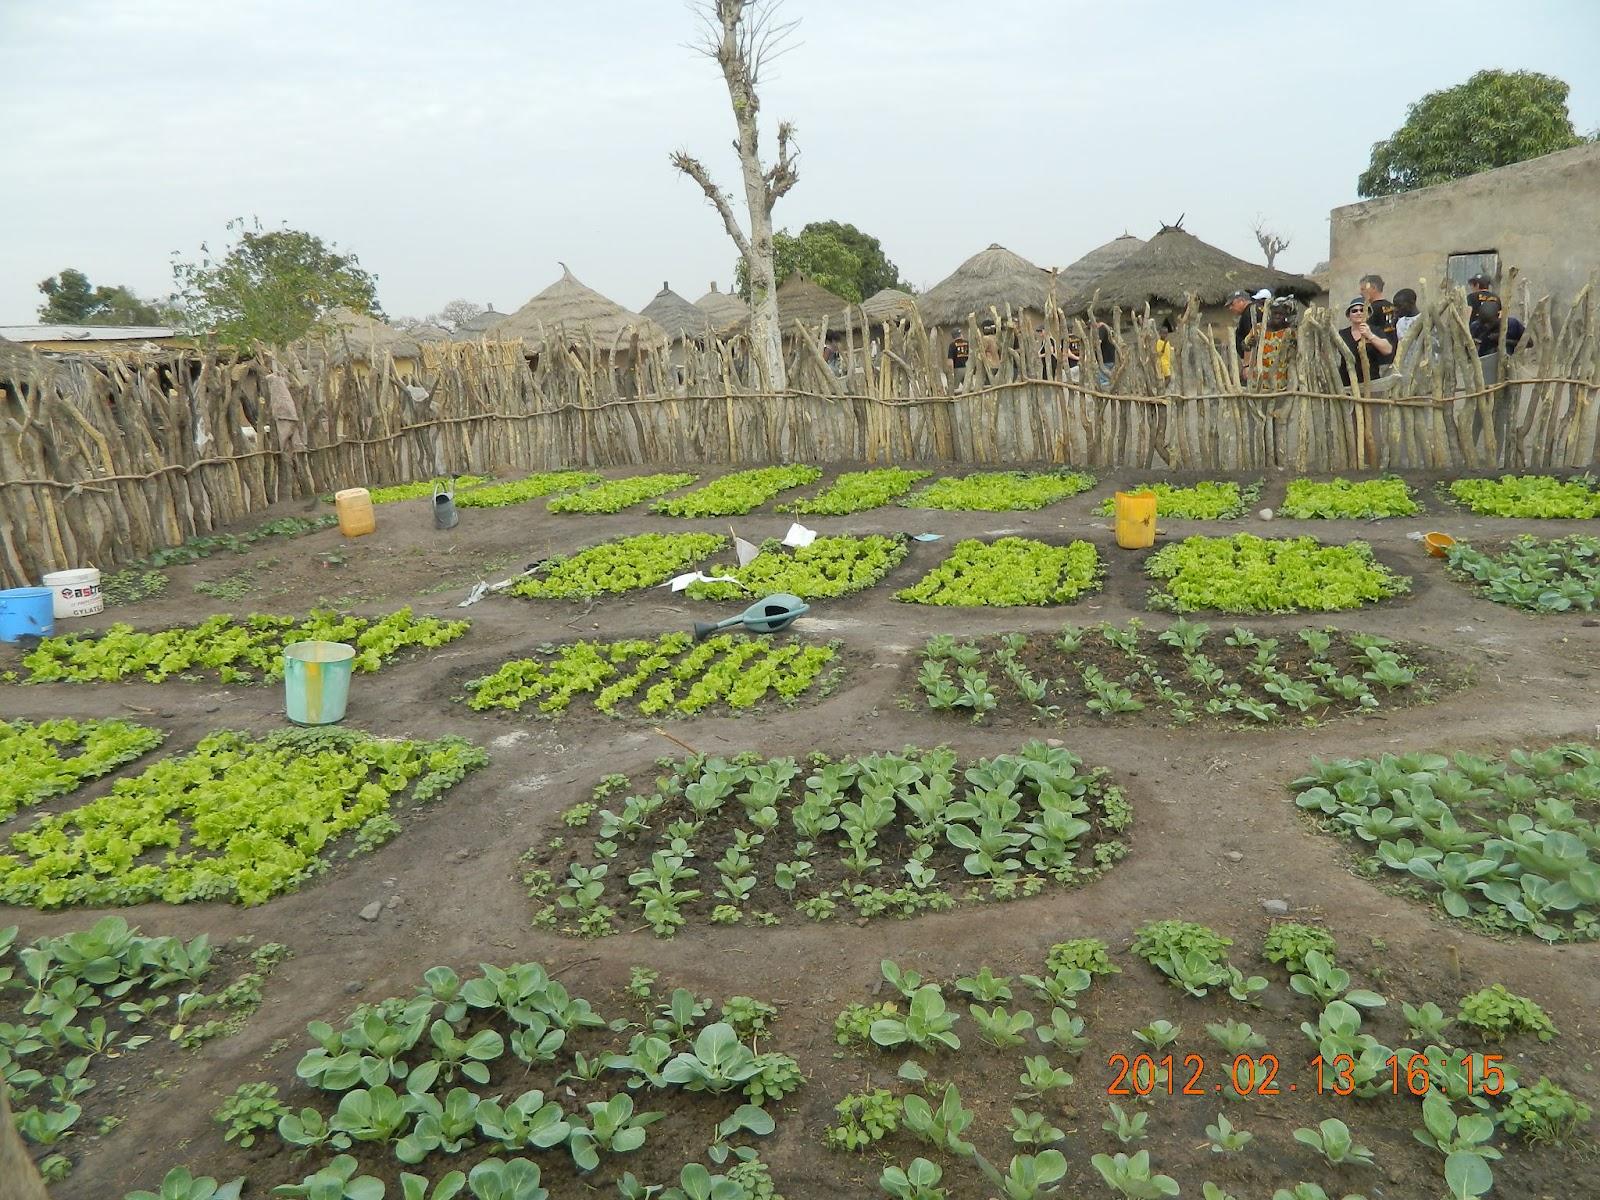 Bretagne mali via carhaix dakar 2012 des jardins for Le jardin dakar